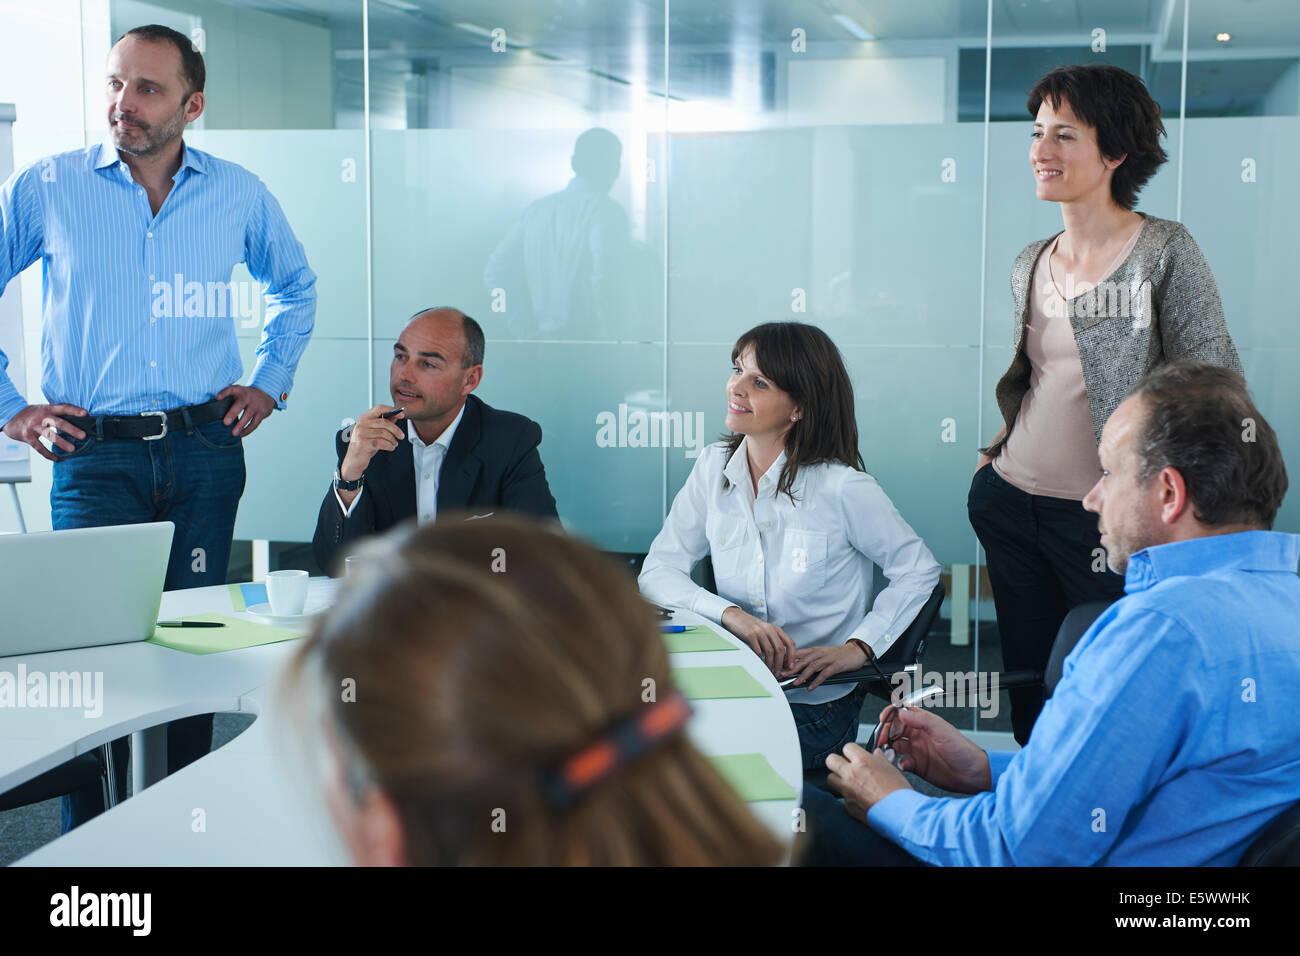 Informal business meeting around boardroom table - Stock Image